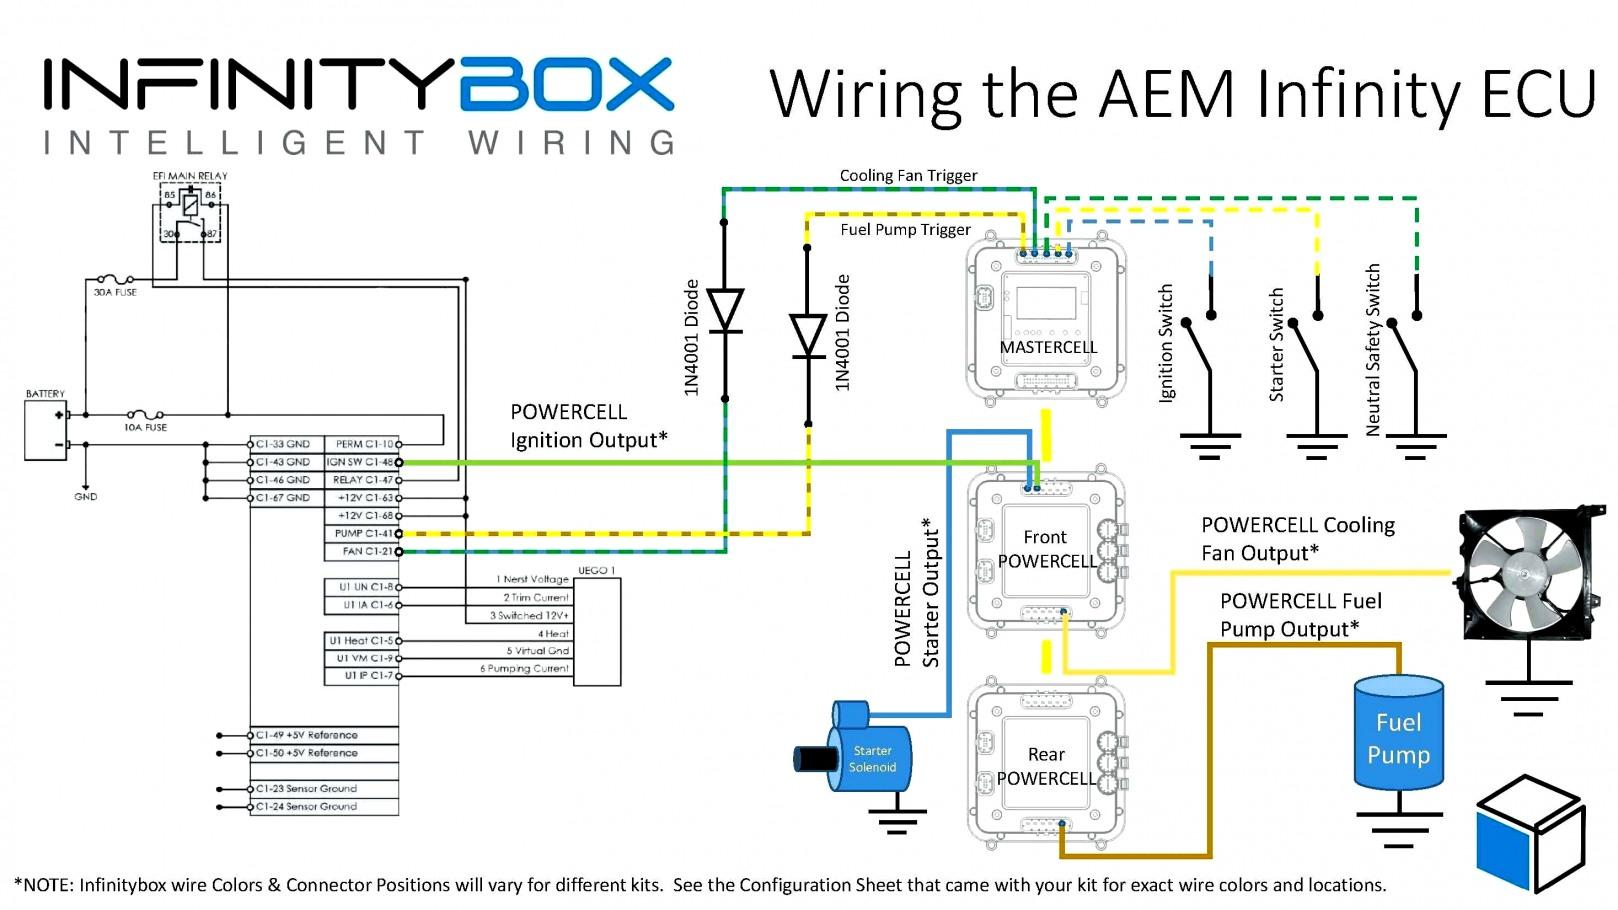 Great Of Twist Lock Plug Wiring Diagram 4 Prong Schematic Diagrams - 3 Prong Twist Lock Plug Wiring Diagram